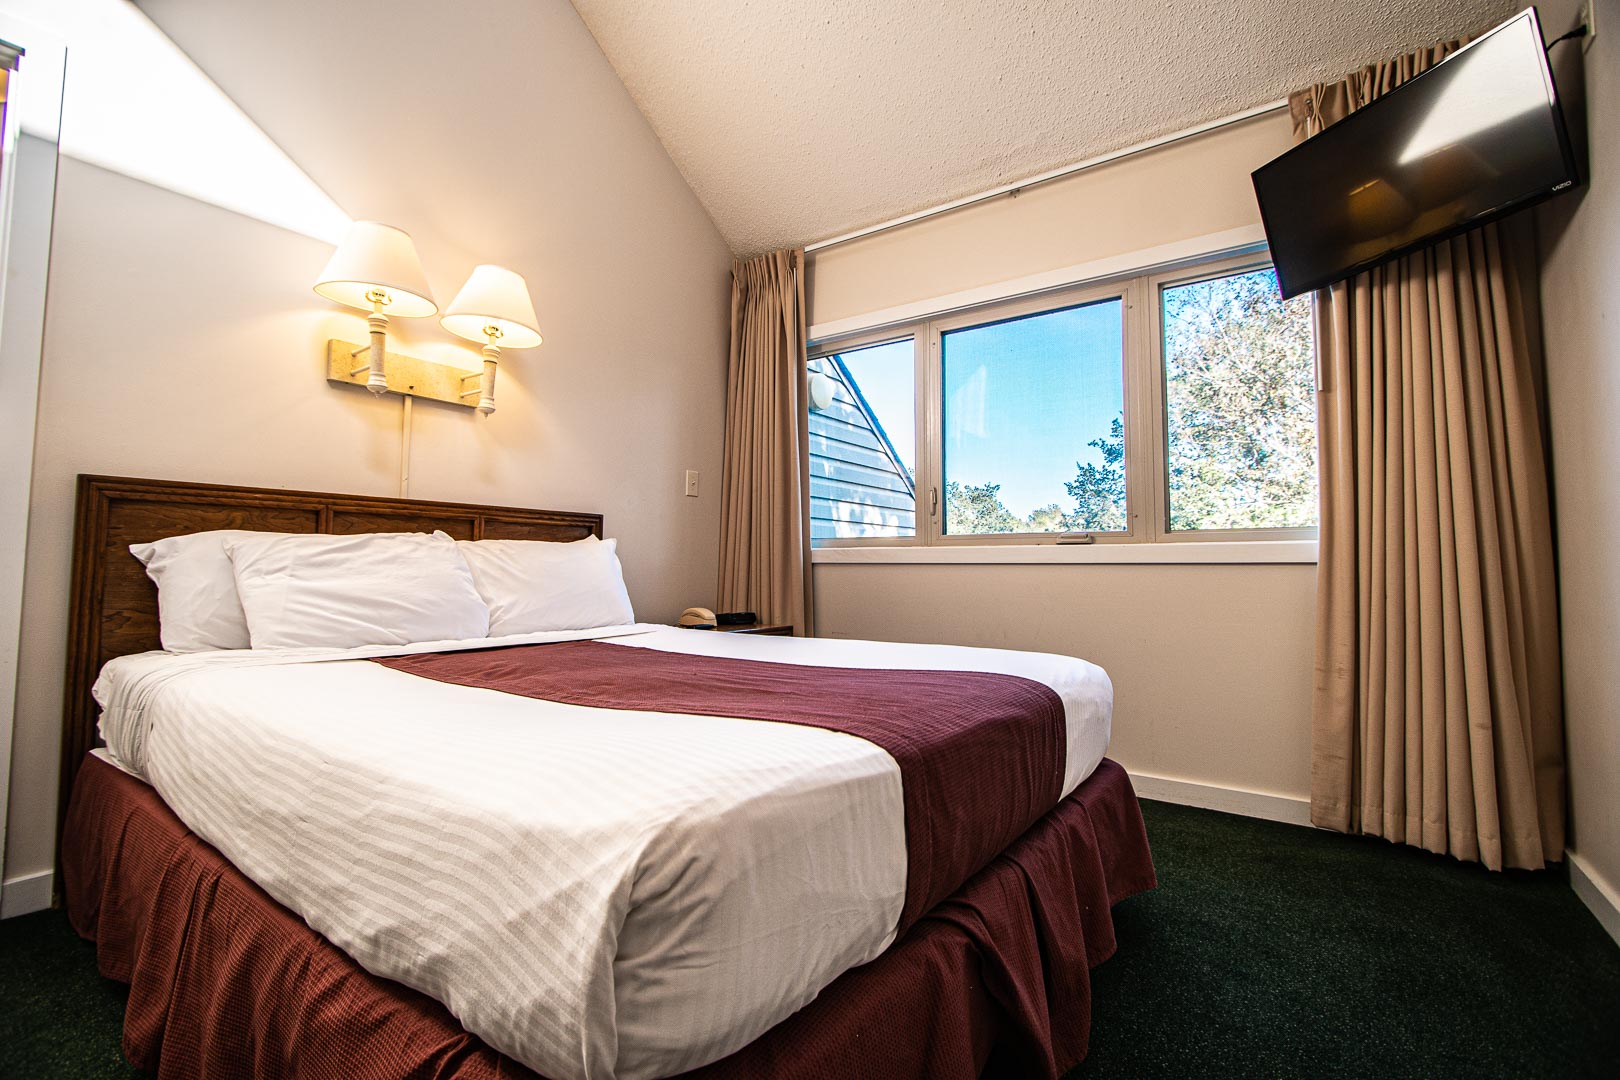 A spacious master bedroom at VRI's Sandcastle Village in New Bern, North Carolina.